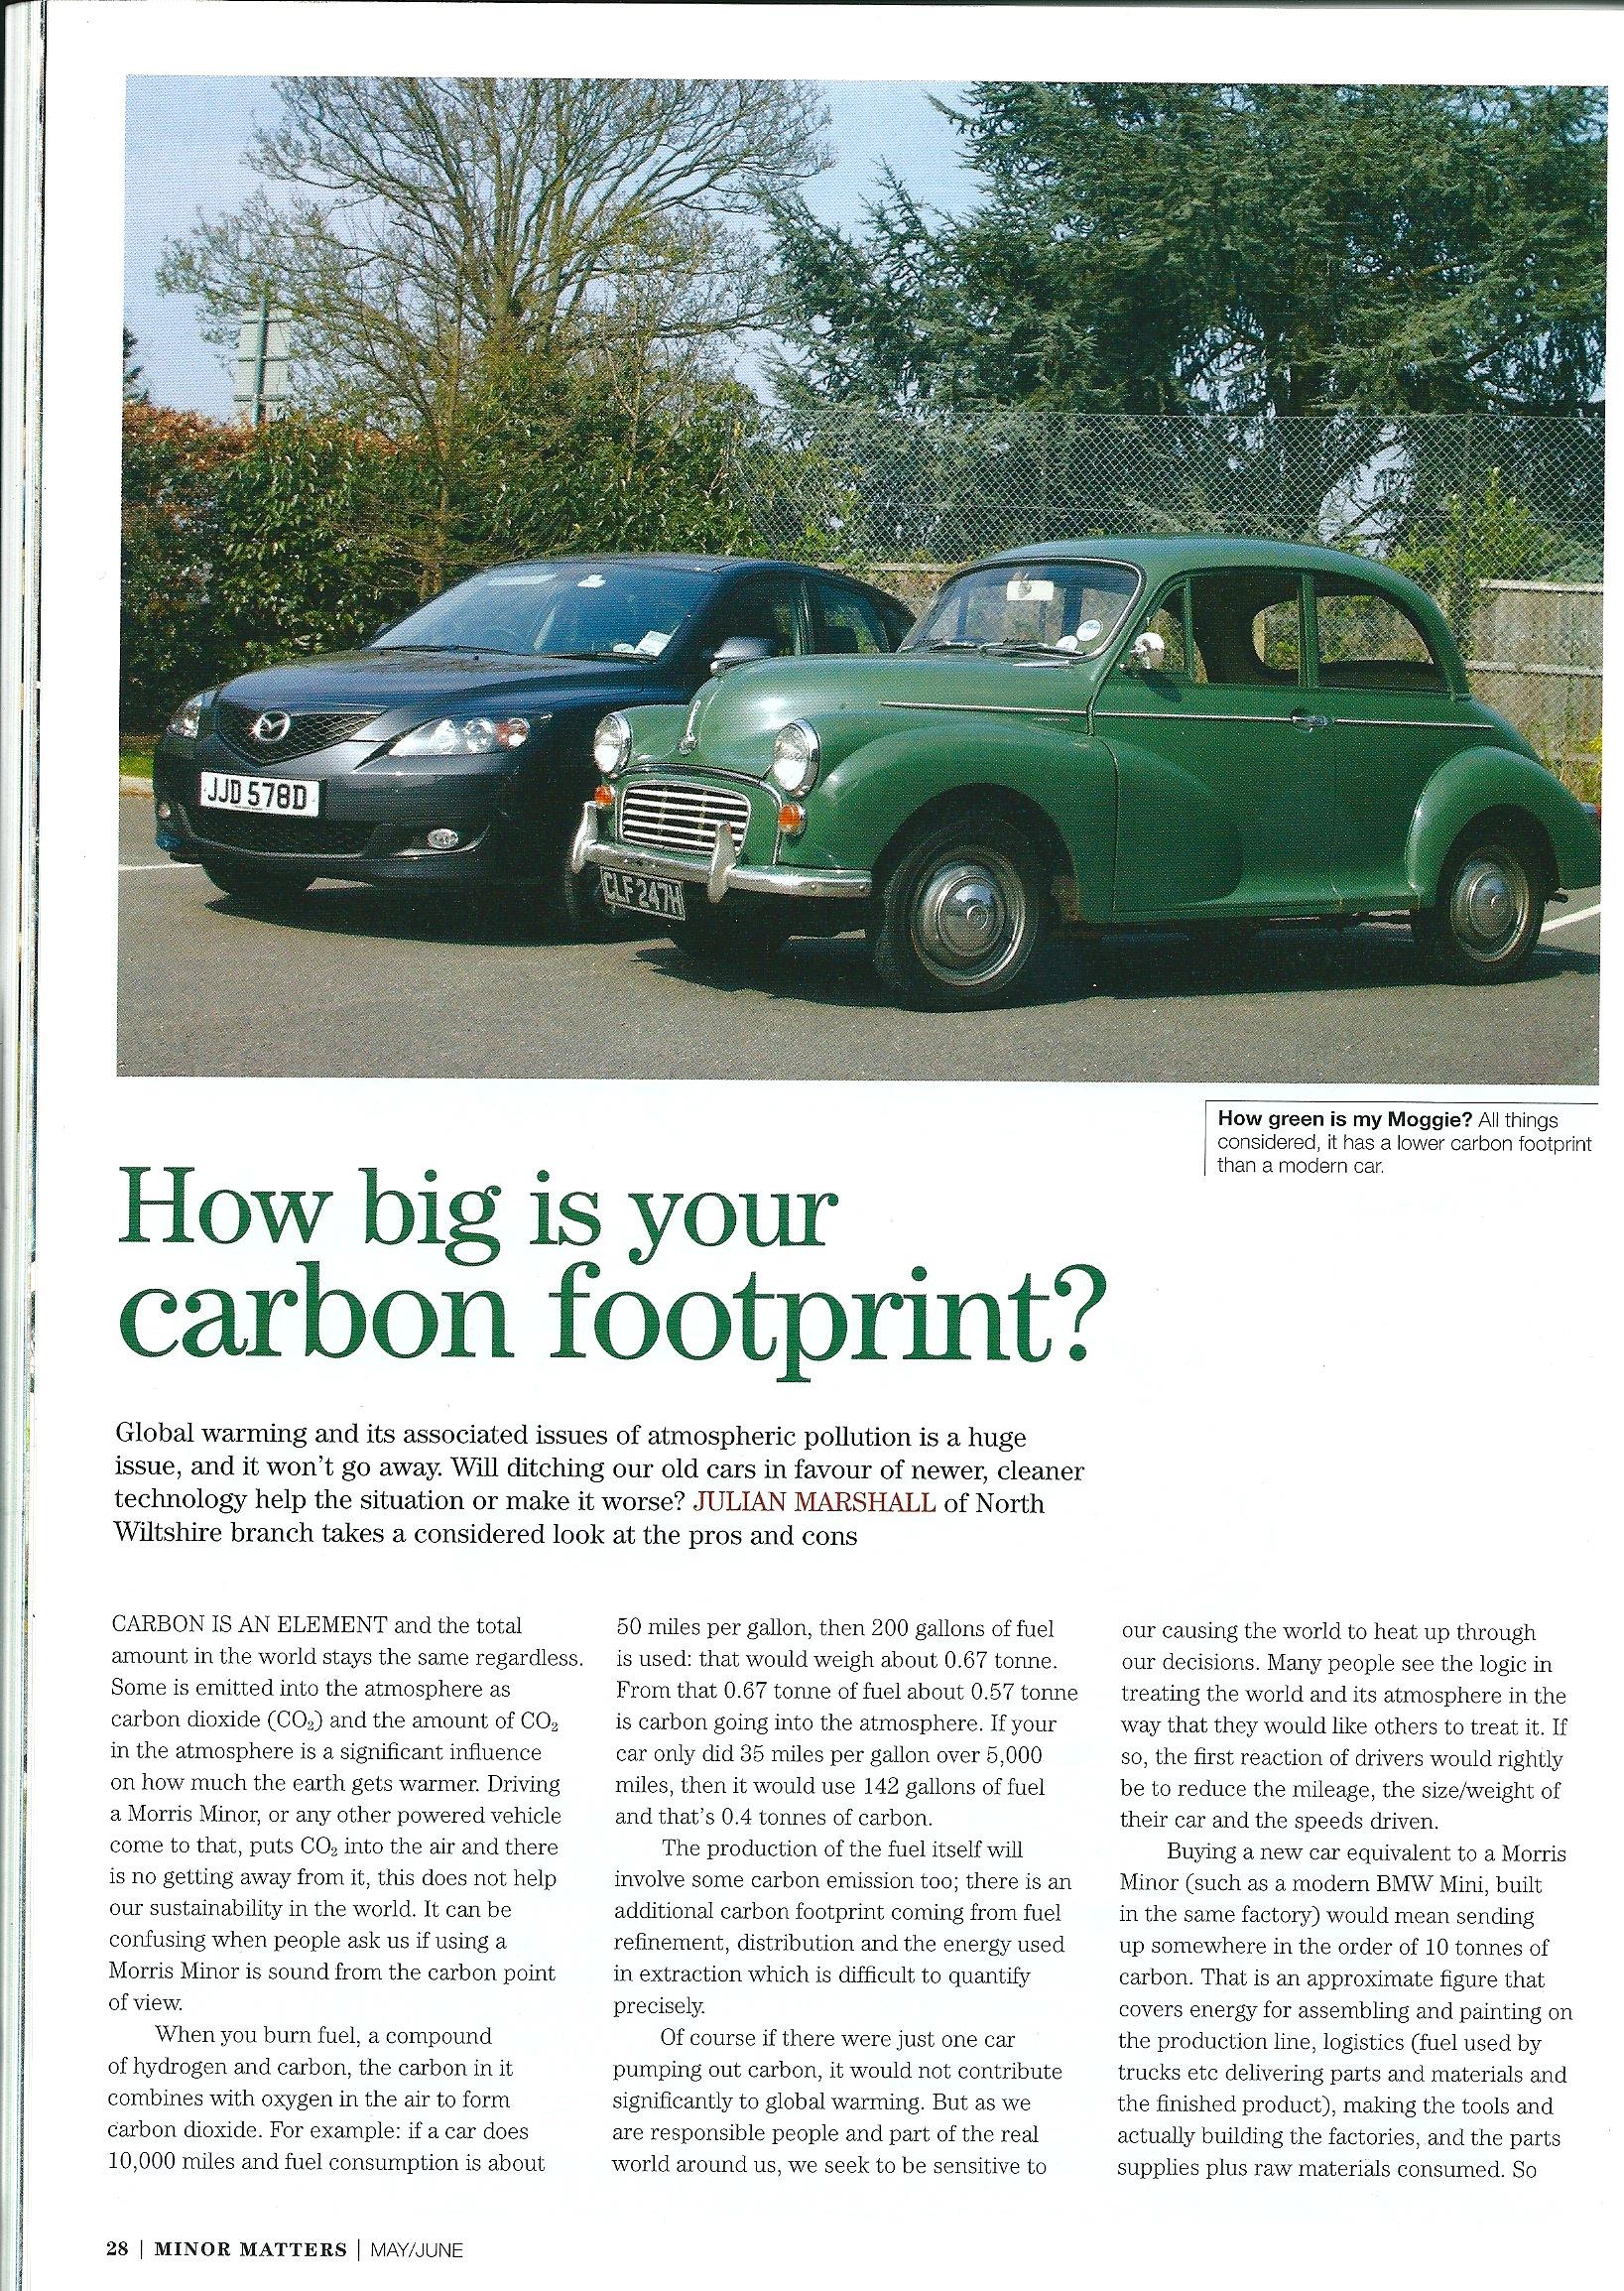 carbon footprint magazine article